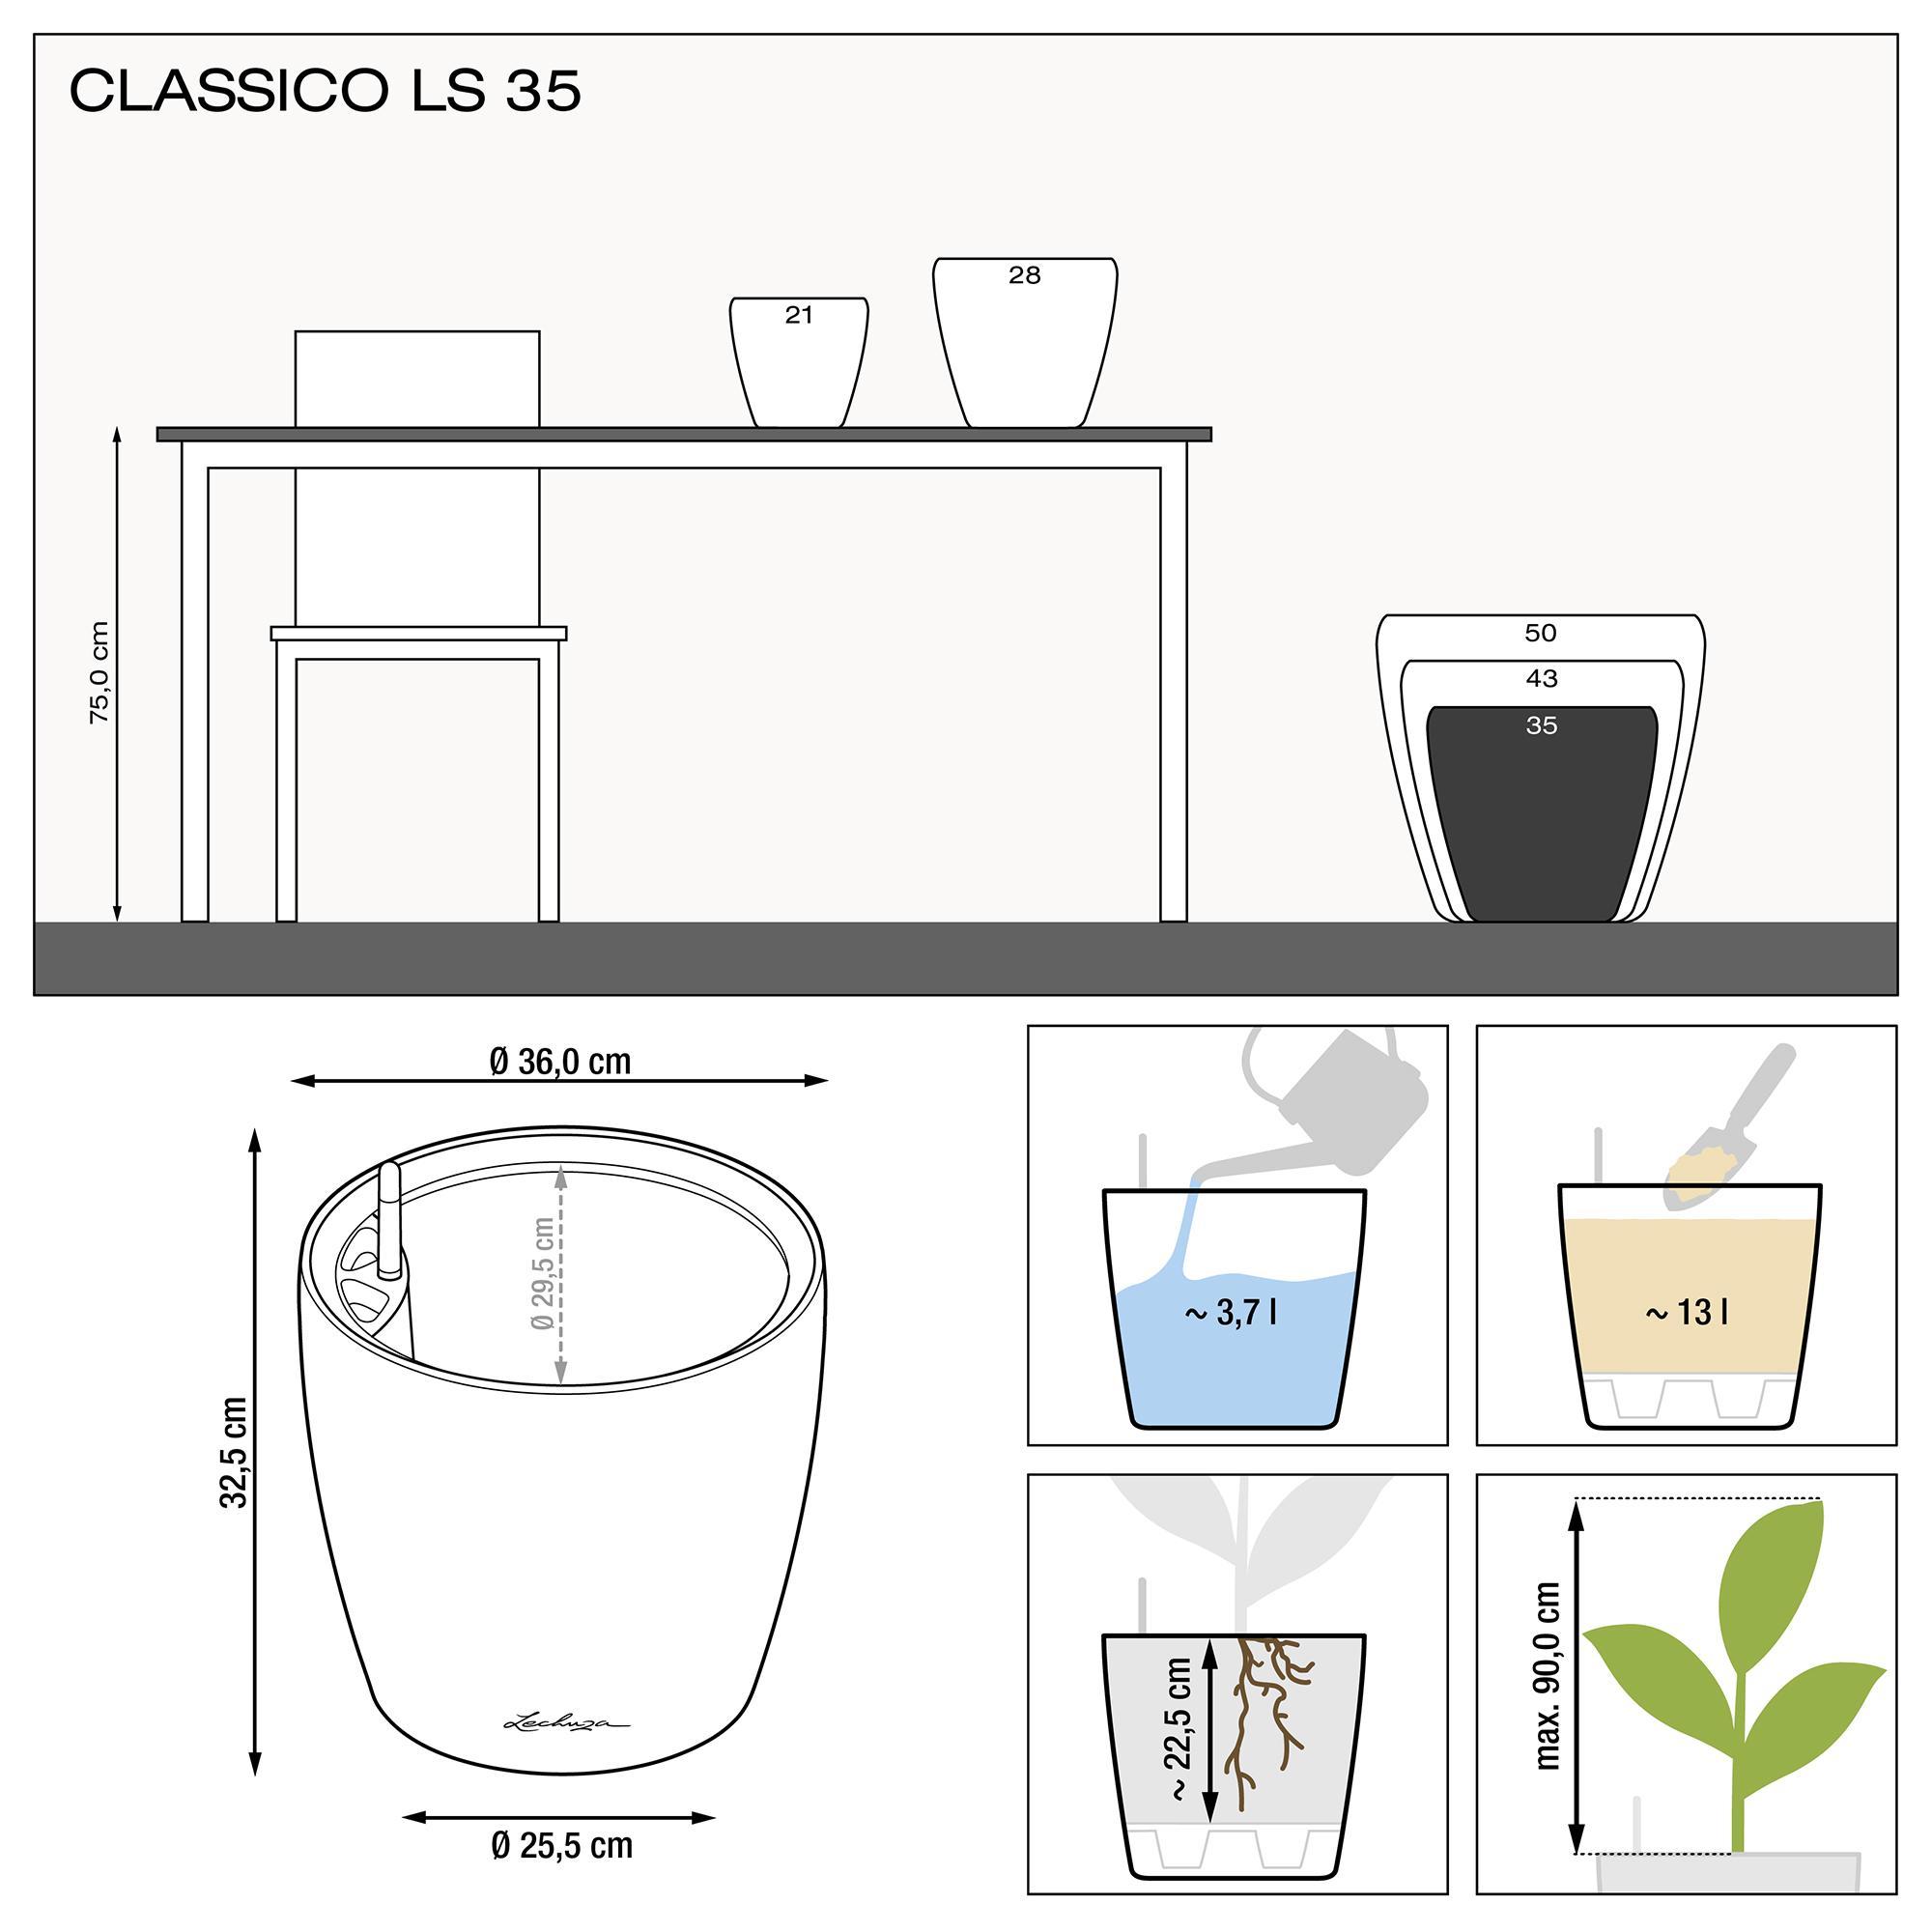 CLASSICO LS 35 silver metallic - Image 3